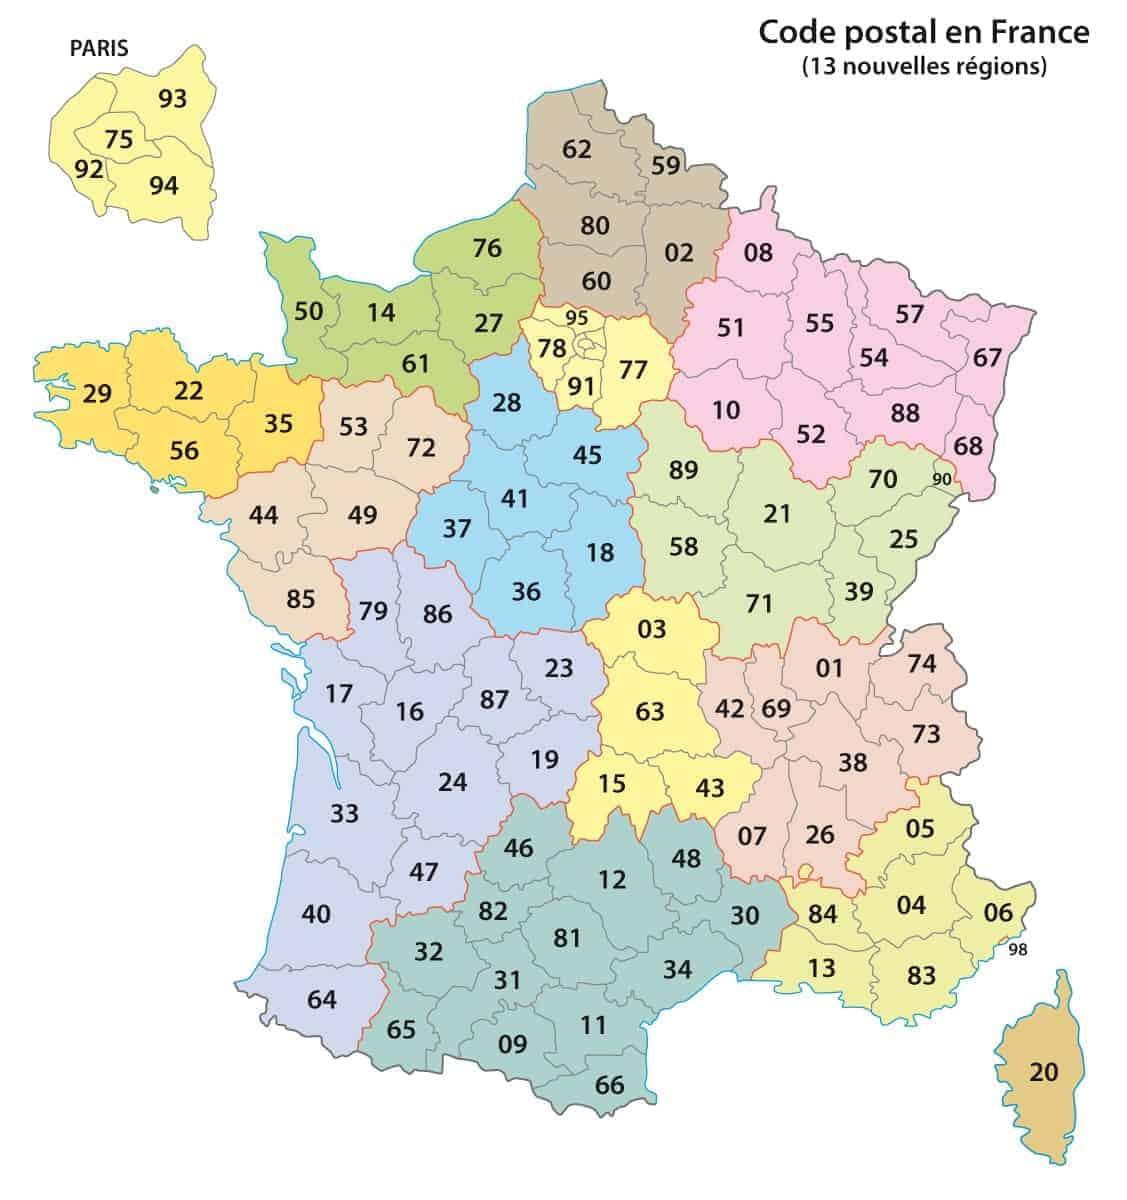 Zip code map of France